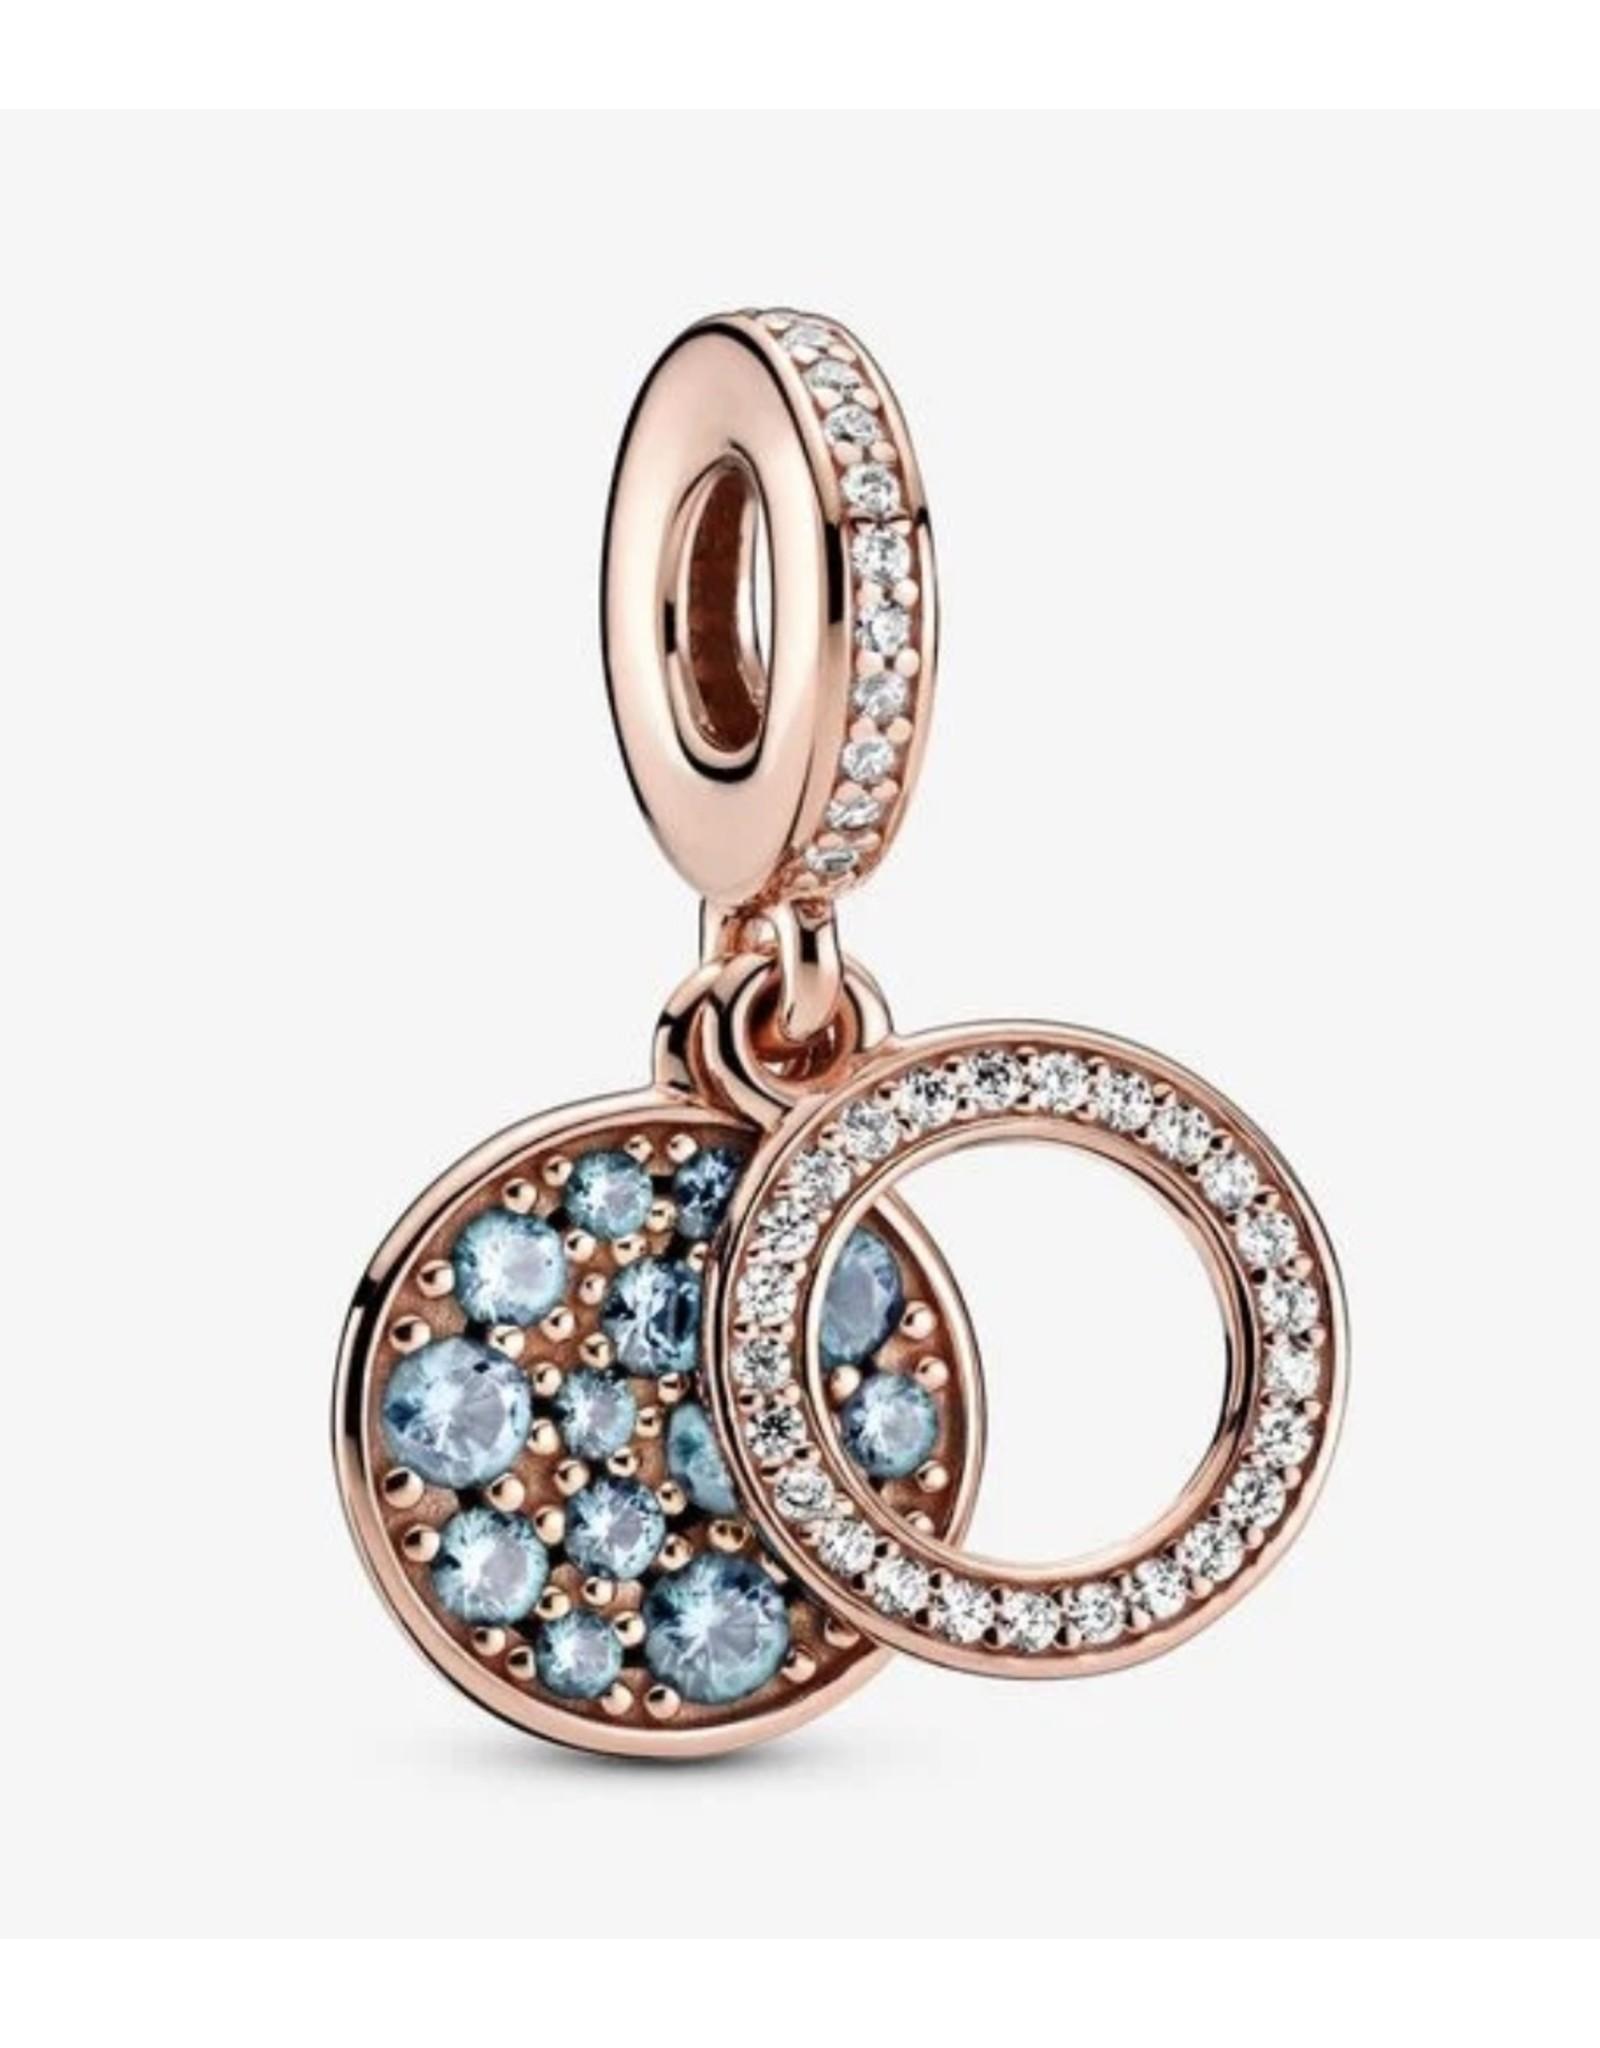 Pandora Pandora Charm, 789186C03, Sparkling Light Blue Disc, CLear CZ&Blue Crystal, Rose Gold